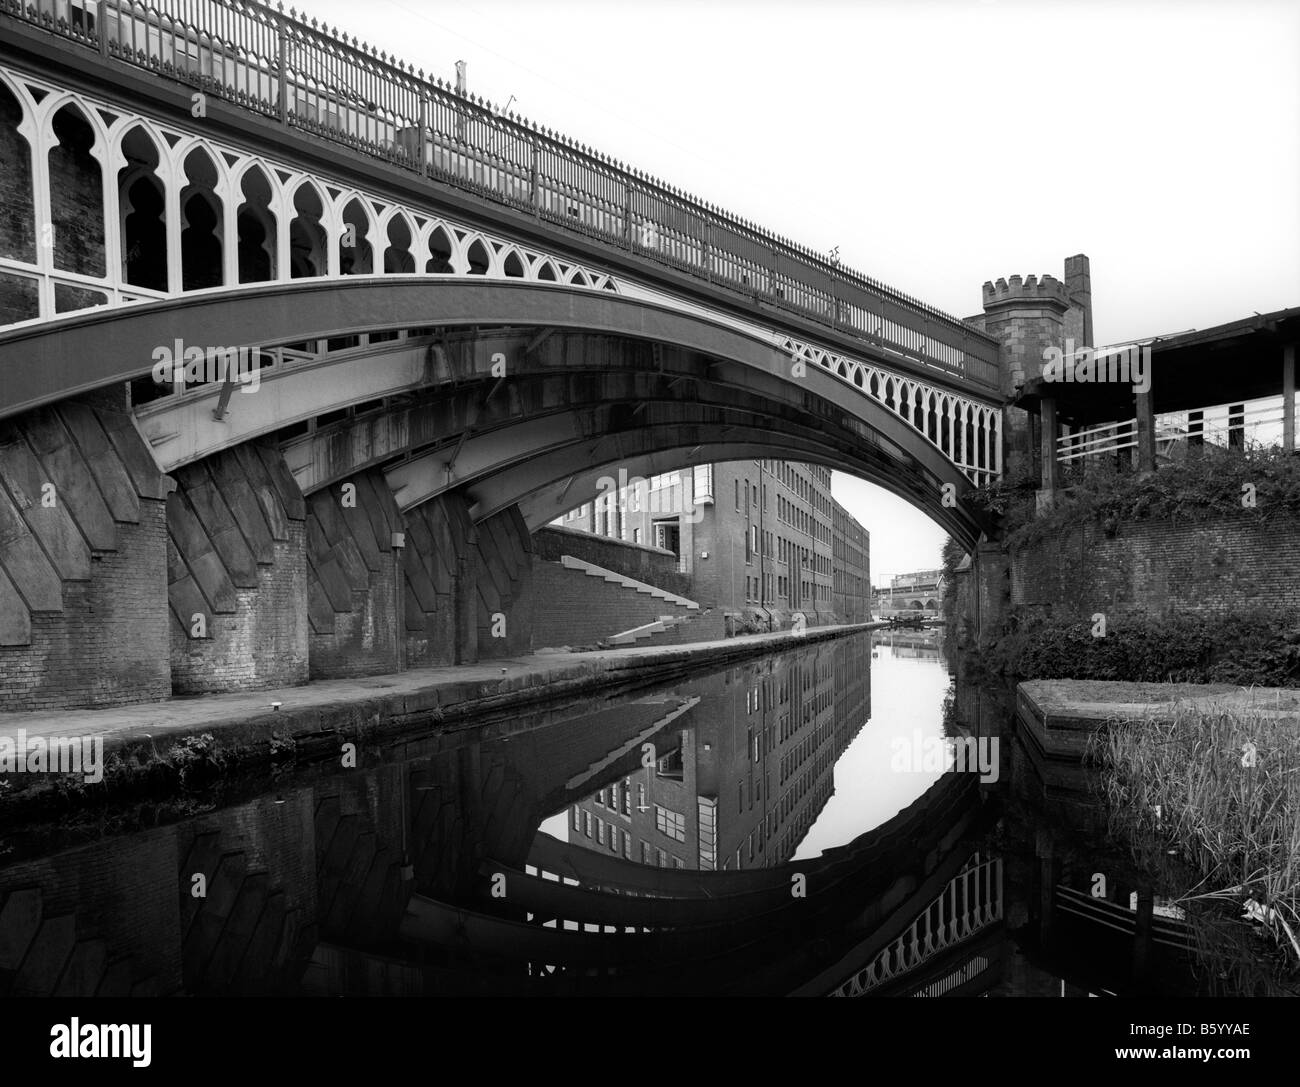 UK England Manchester Castlefield railway bridge over Bridgewater Canal passing through city centre - Stock Image